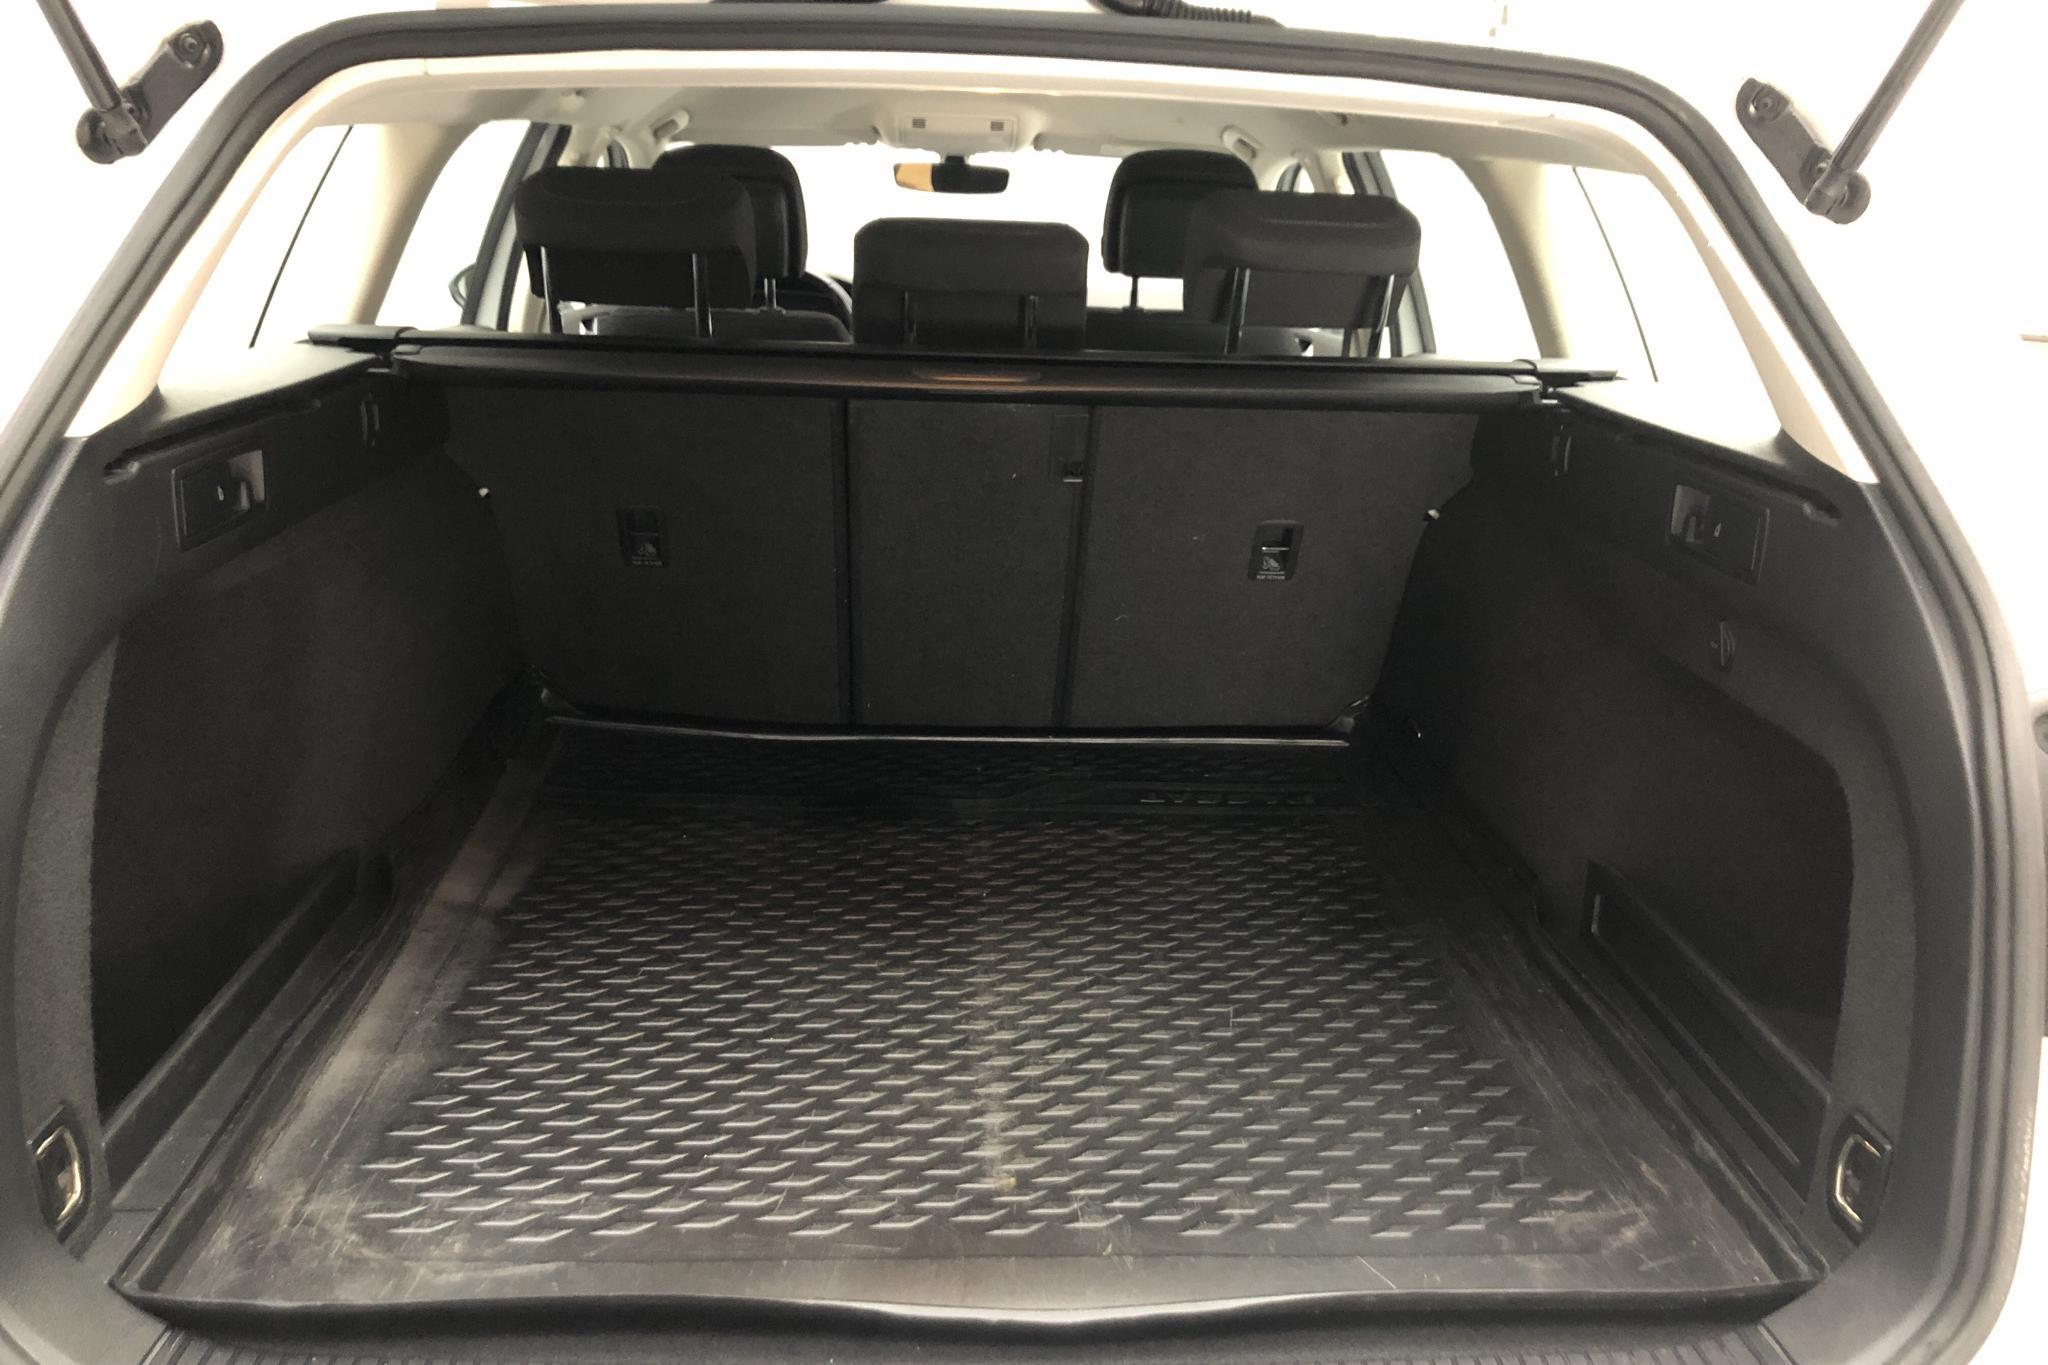 VW Passat 1.4 TSI Sportscombi (150hk) - 4 509 mil - Manuell - vit - 2018